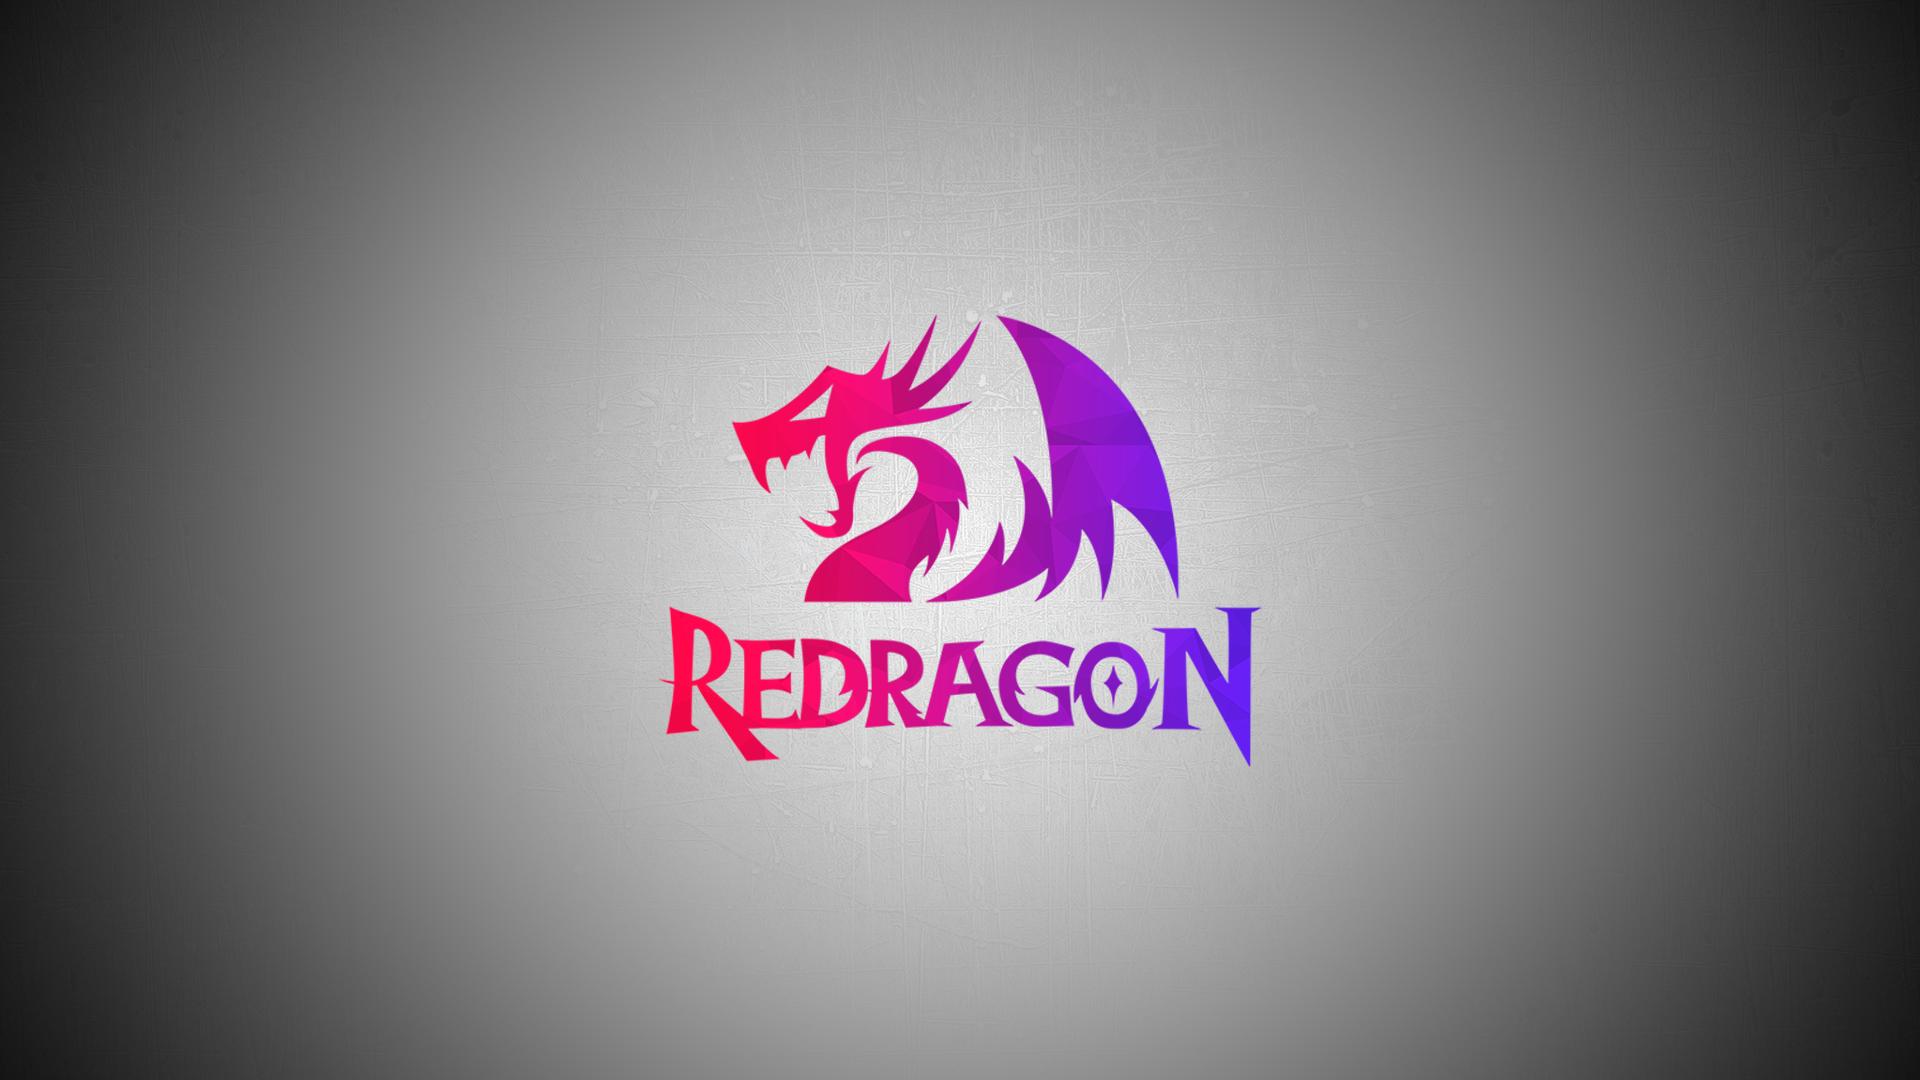 Wallpaper Redragon - Pink Purple